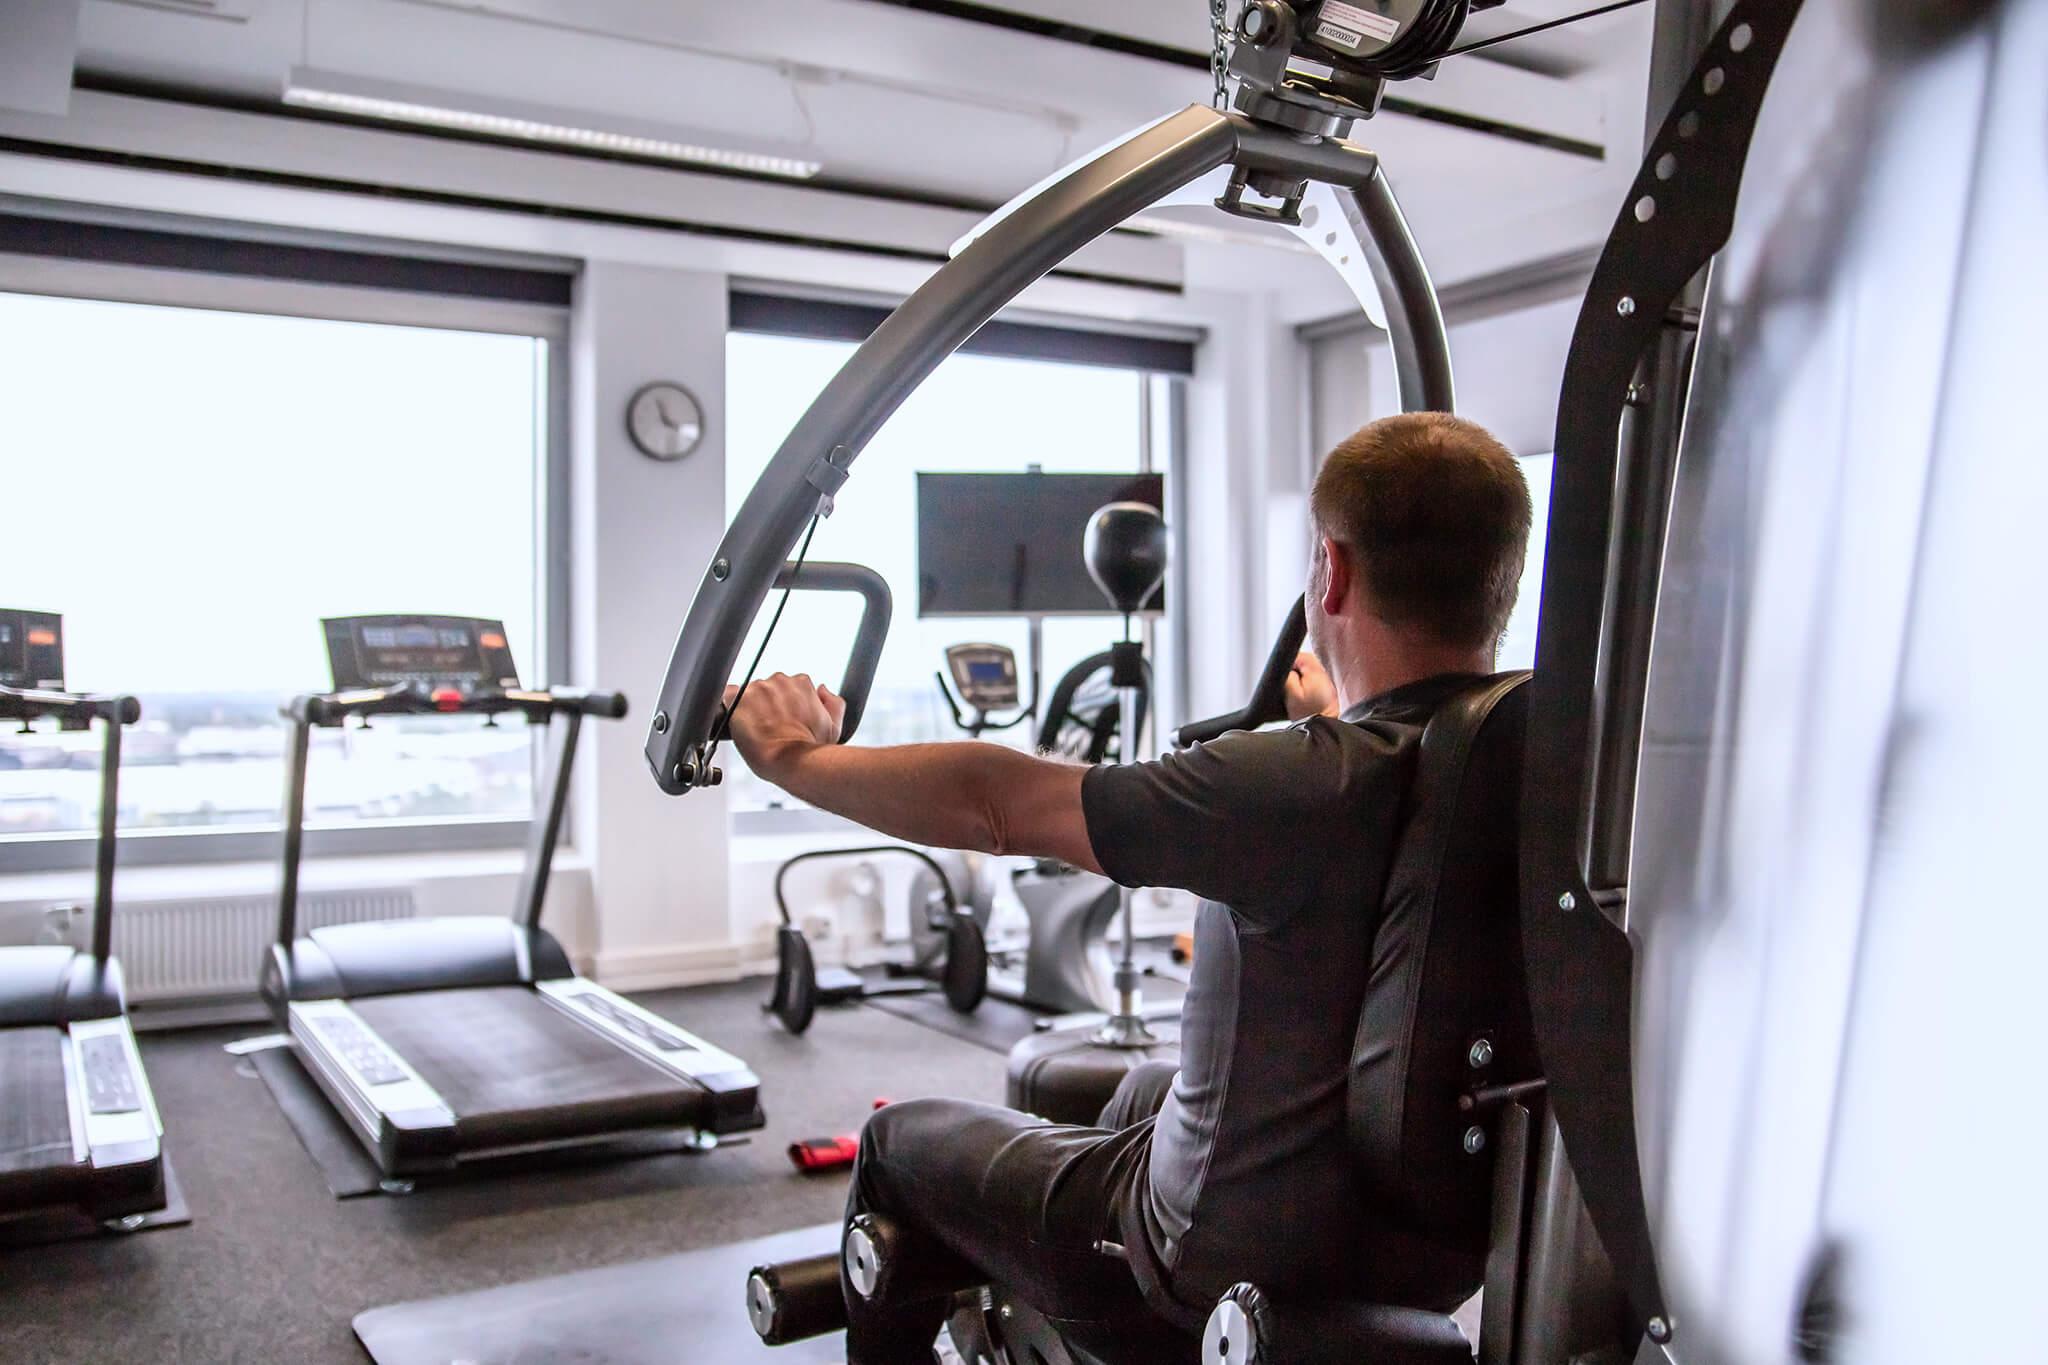 Blick ins otris-Fitnessstudio